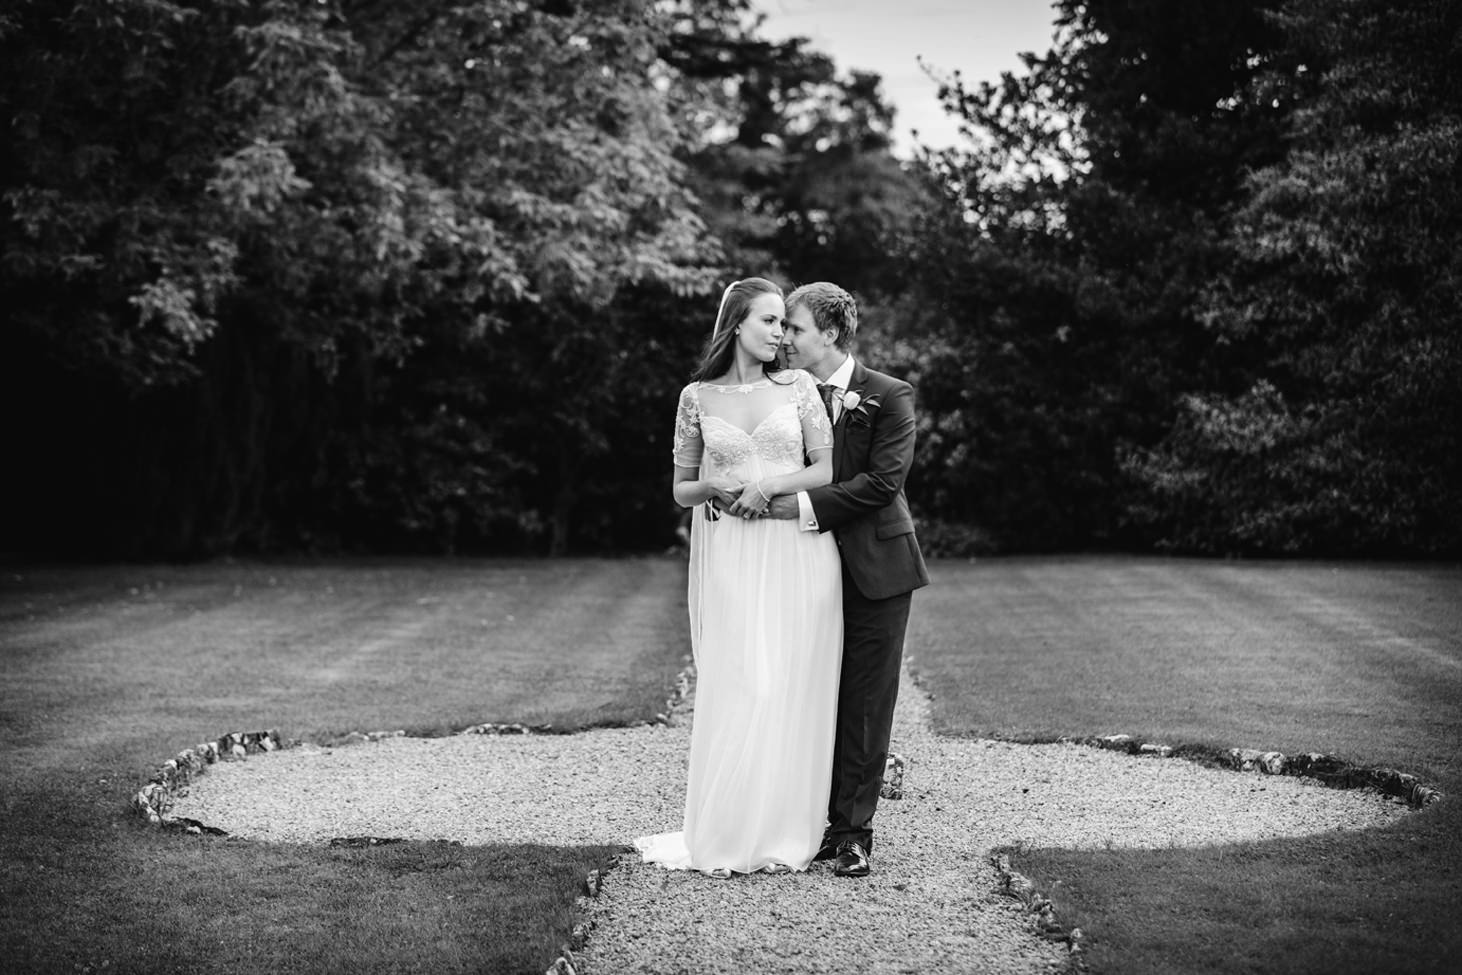 caswell house wedding photography romantic portrait